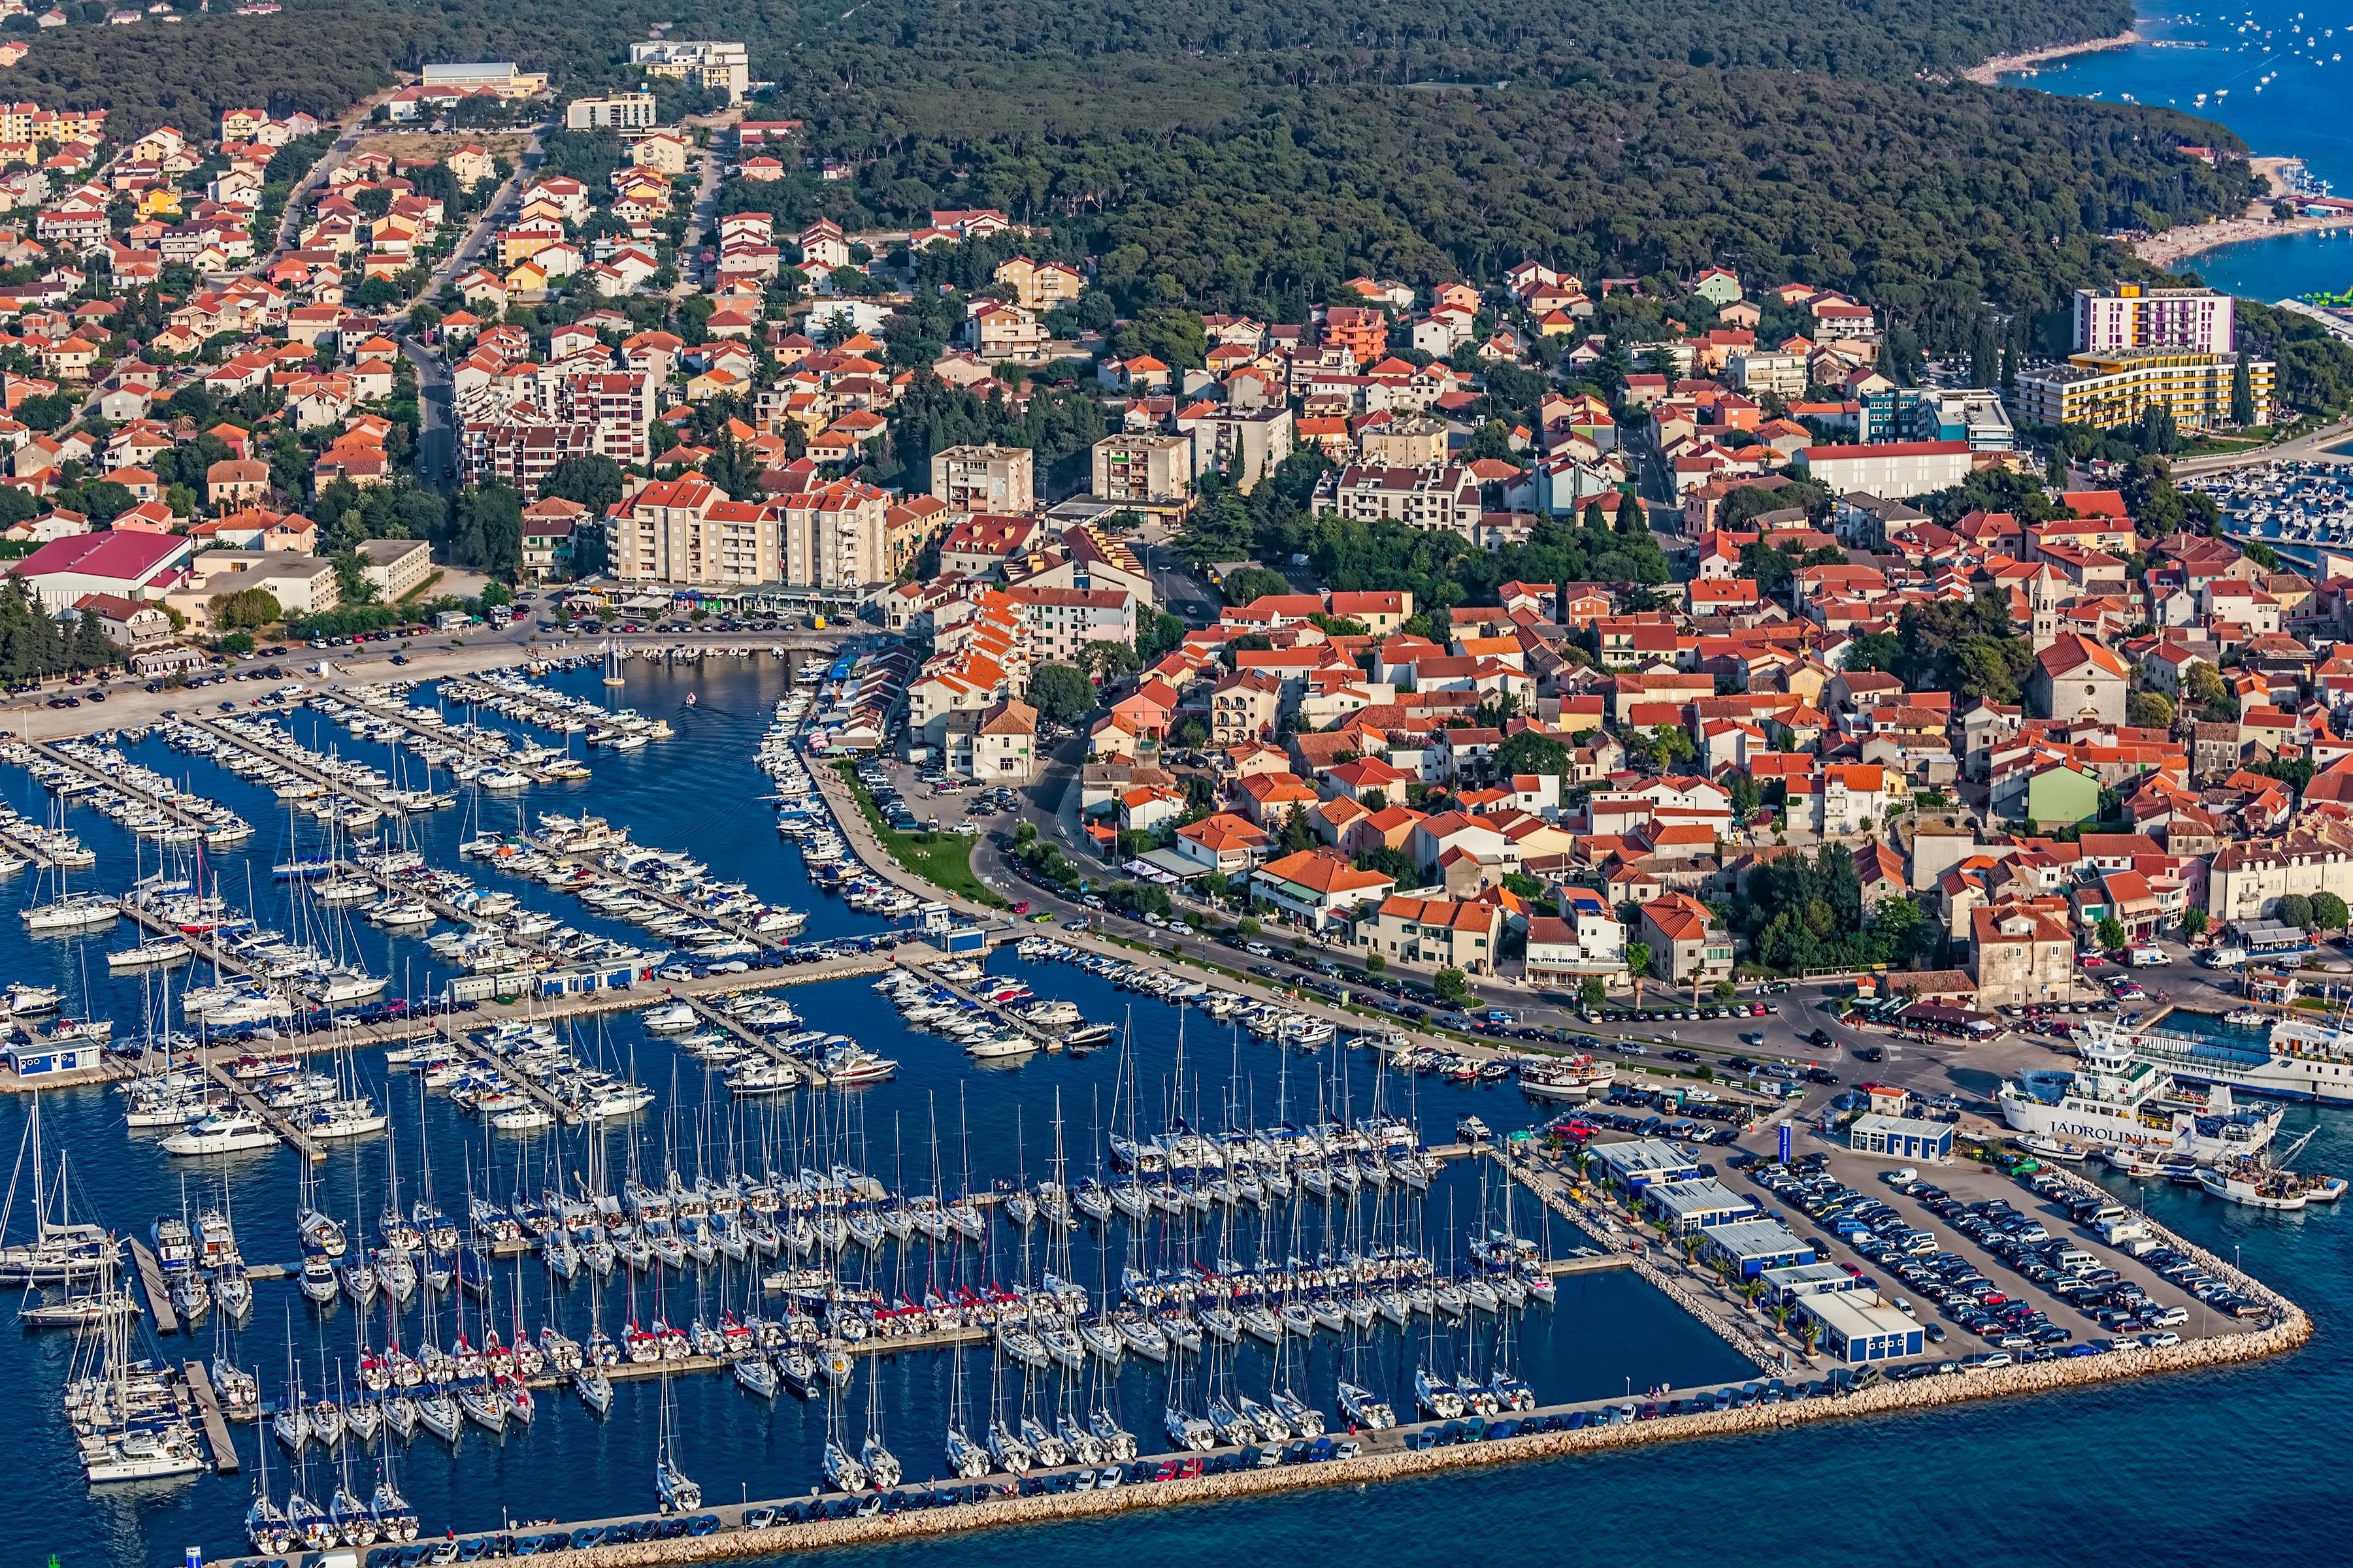 Biograd na Moru, Zadar, Croatia